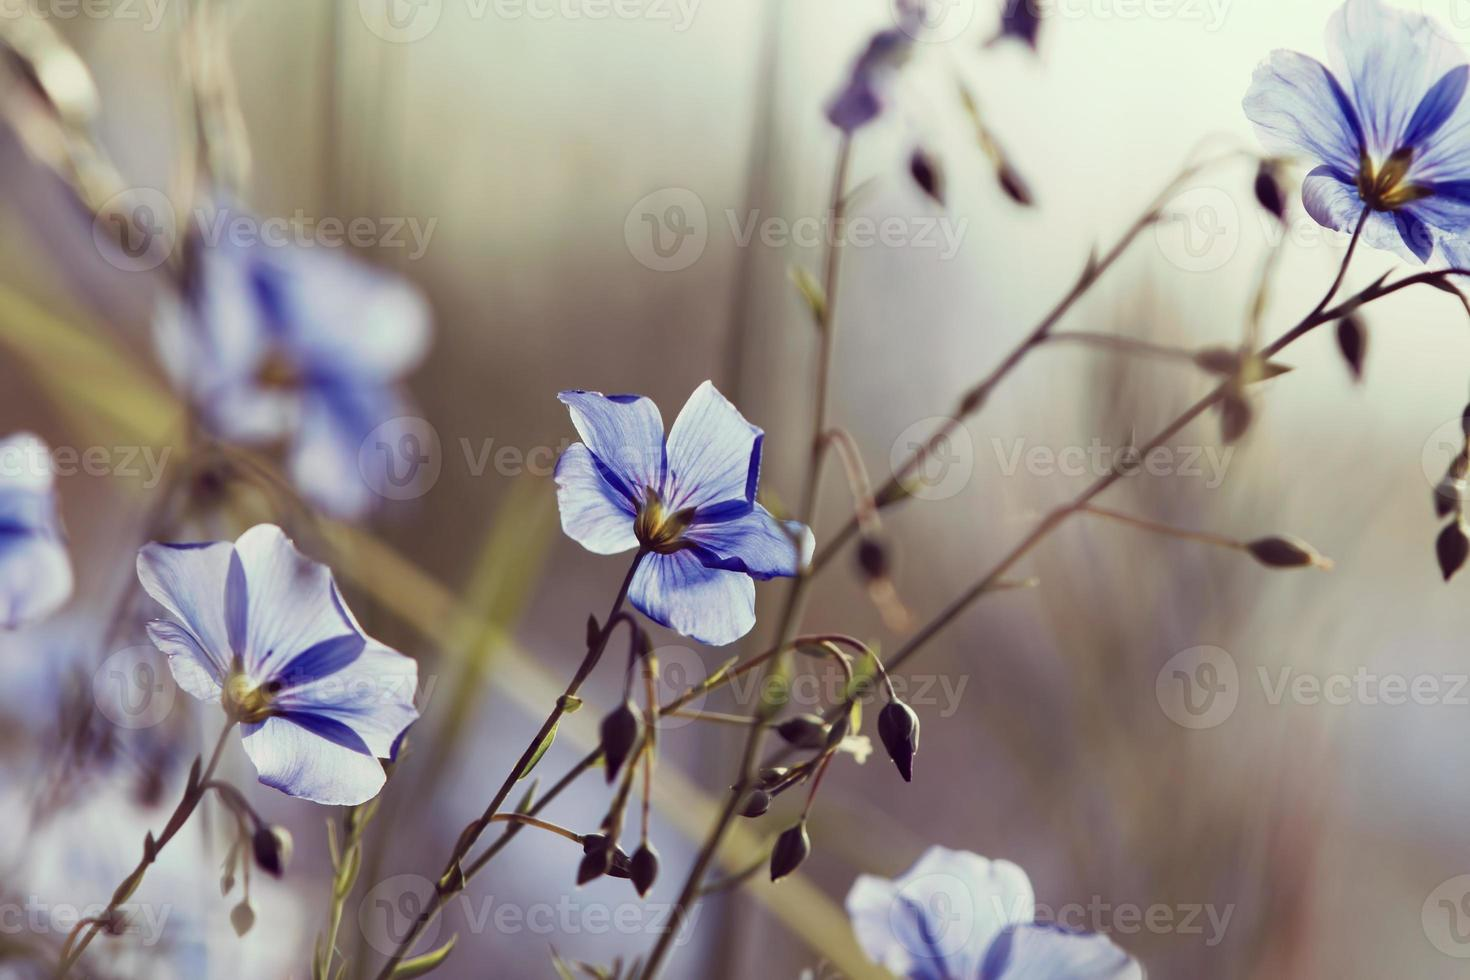 Flowers, spring photo